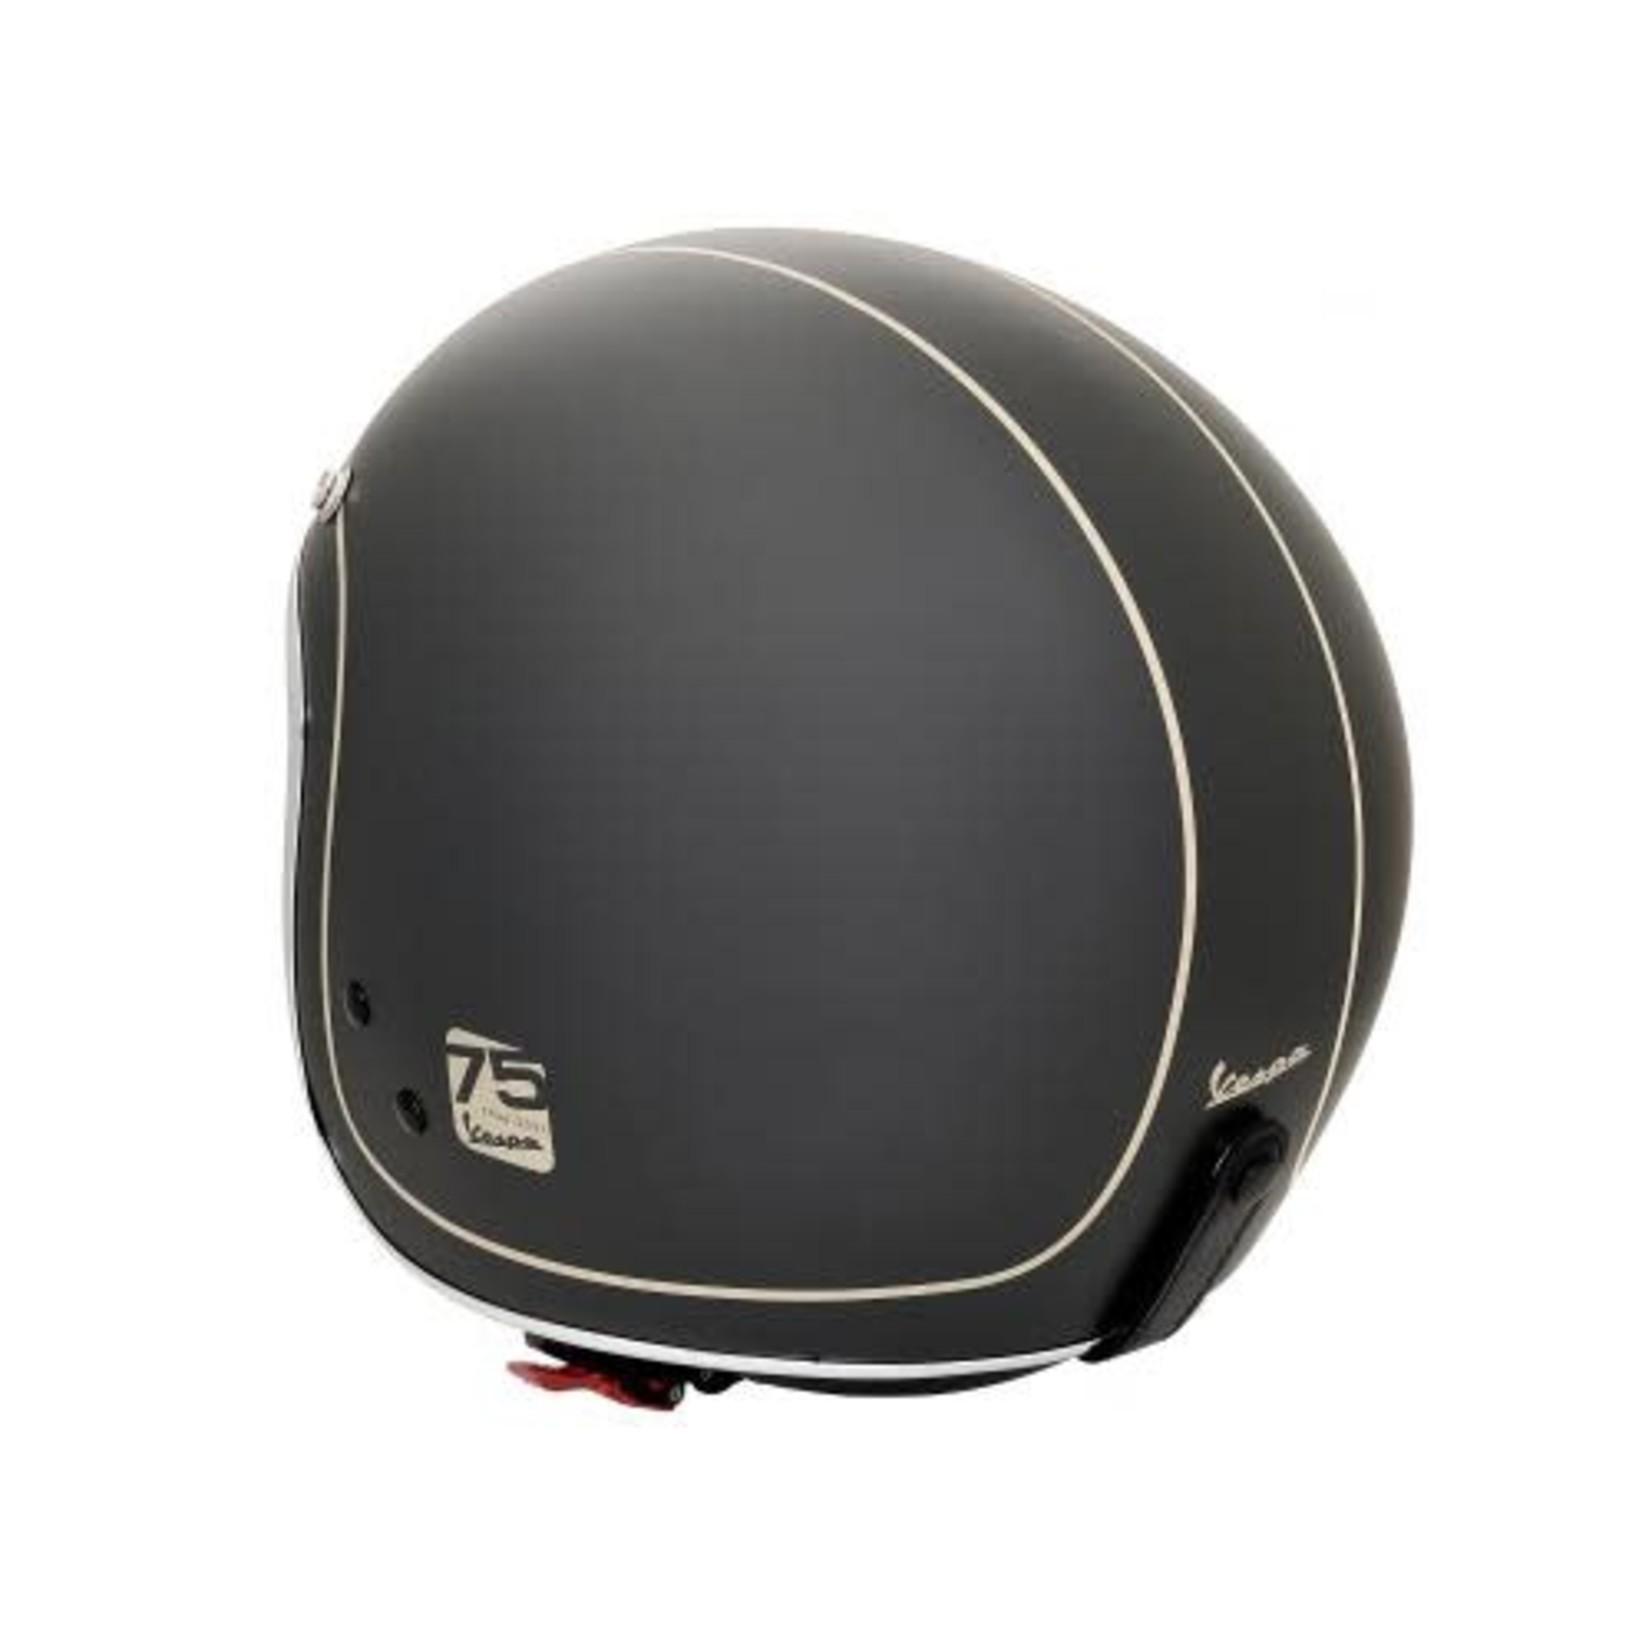 Apparel Helmet, Vespa 75th Anniversary Edition